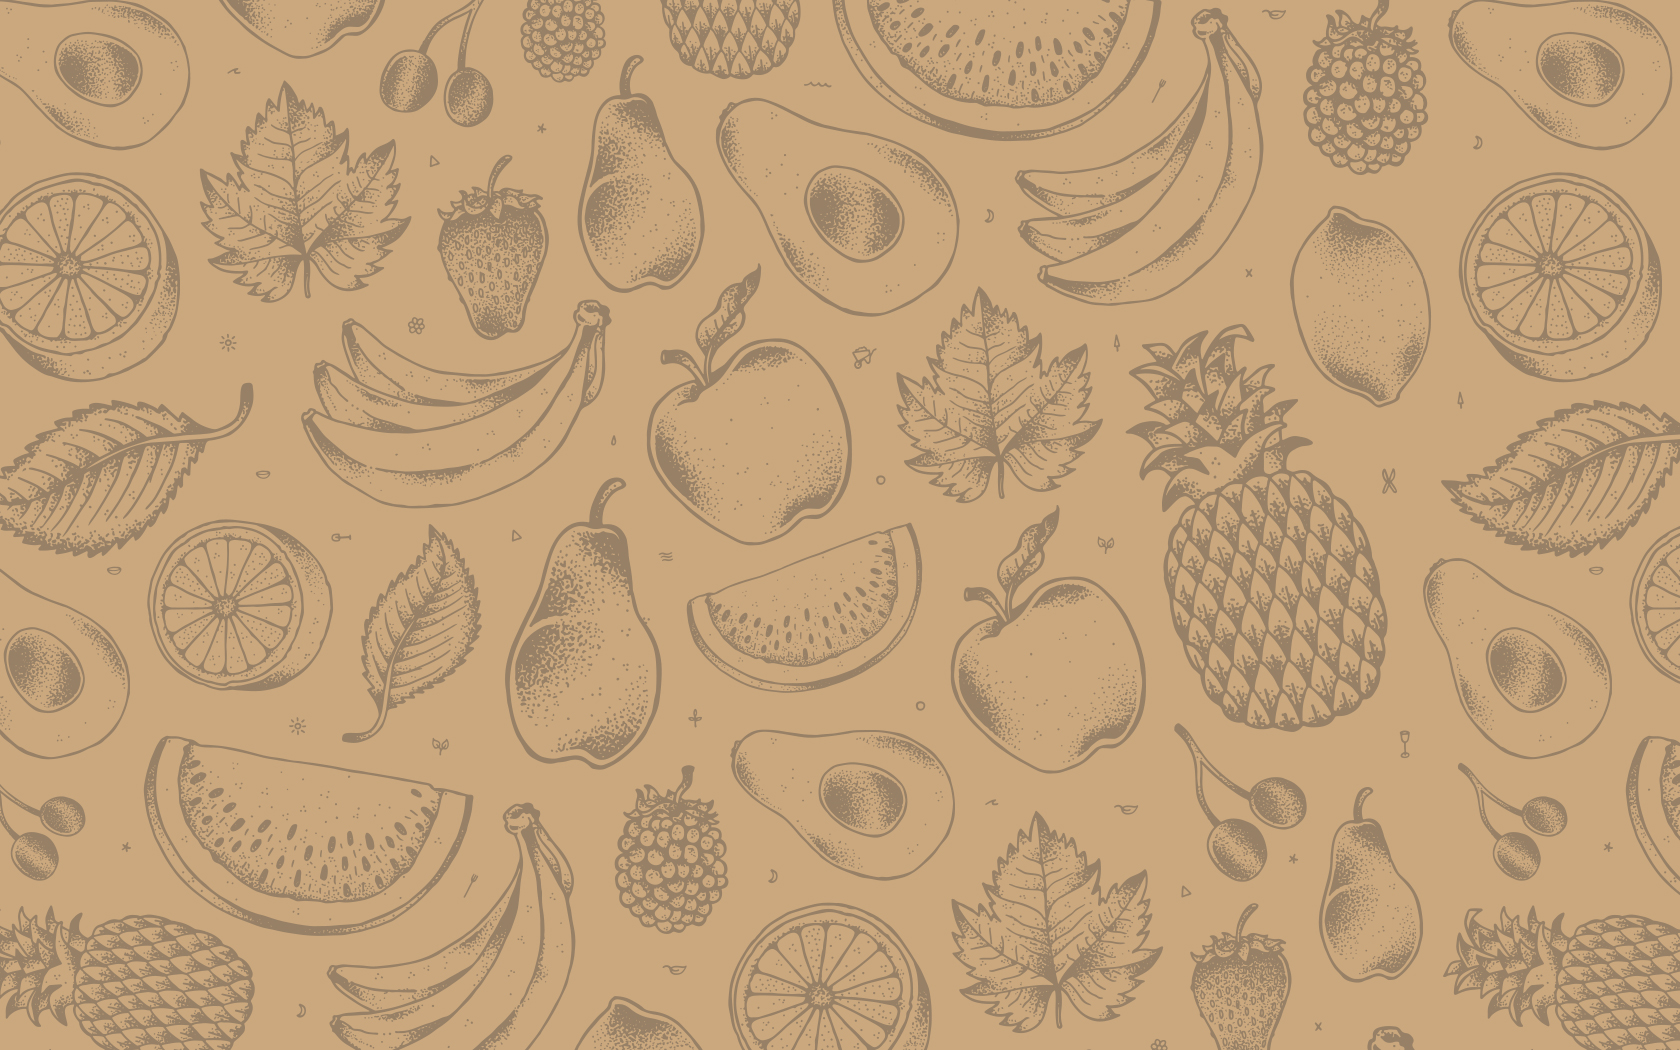 Fruit Wallpaper For Kitchen Fruit wallpaper kitchen 1680x1050